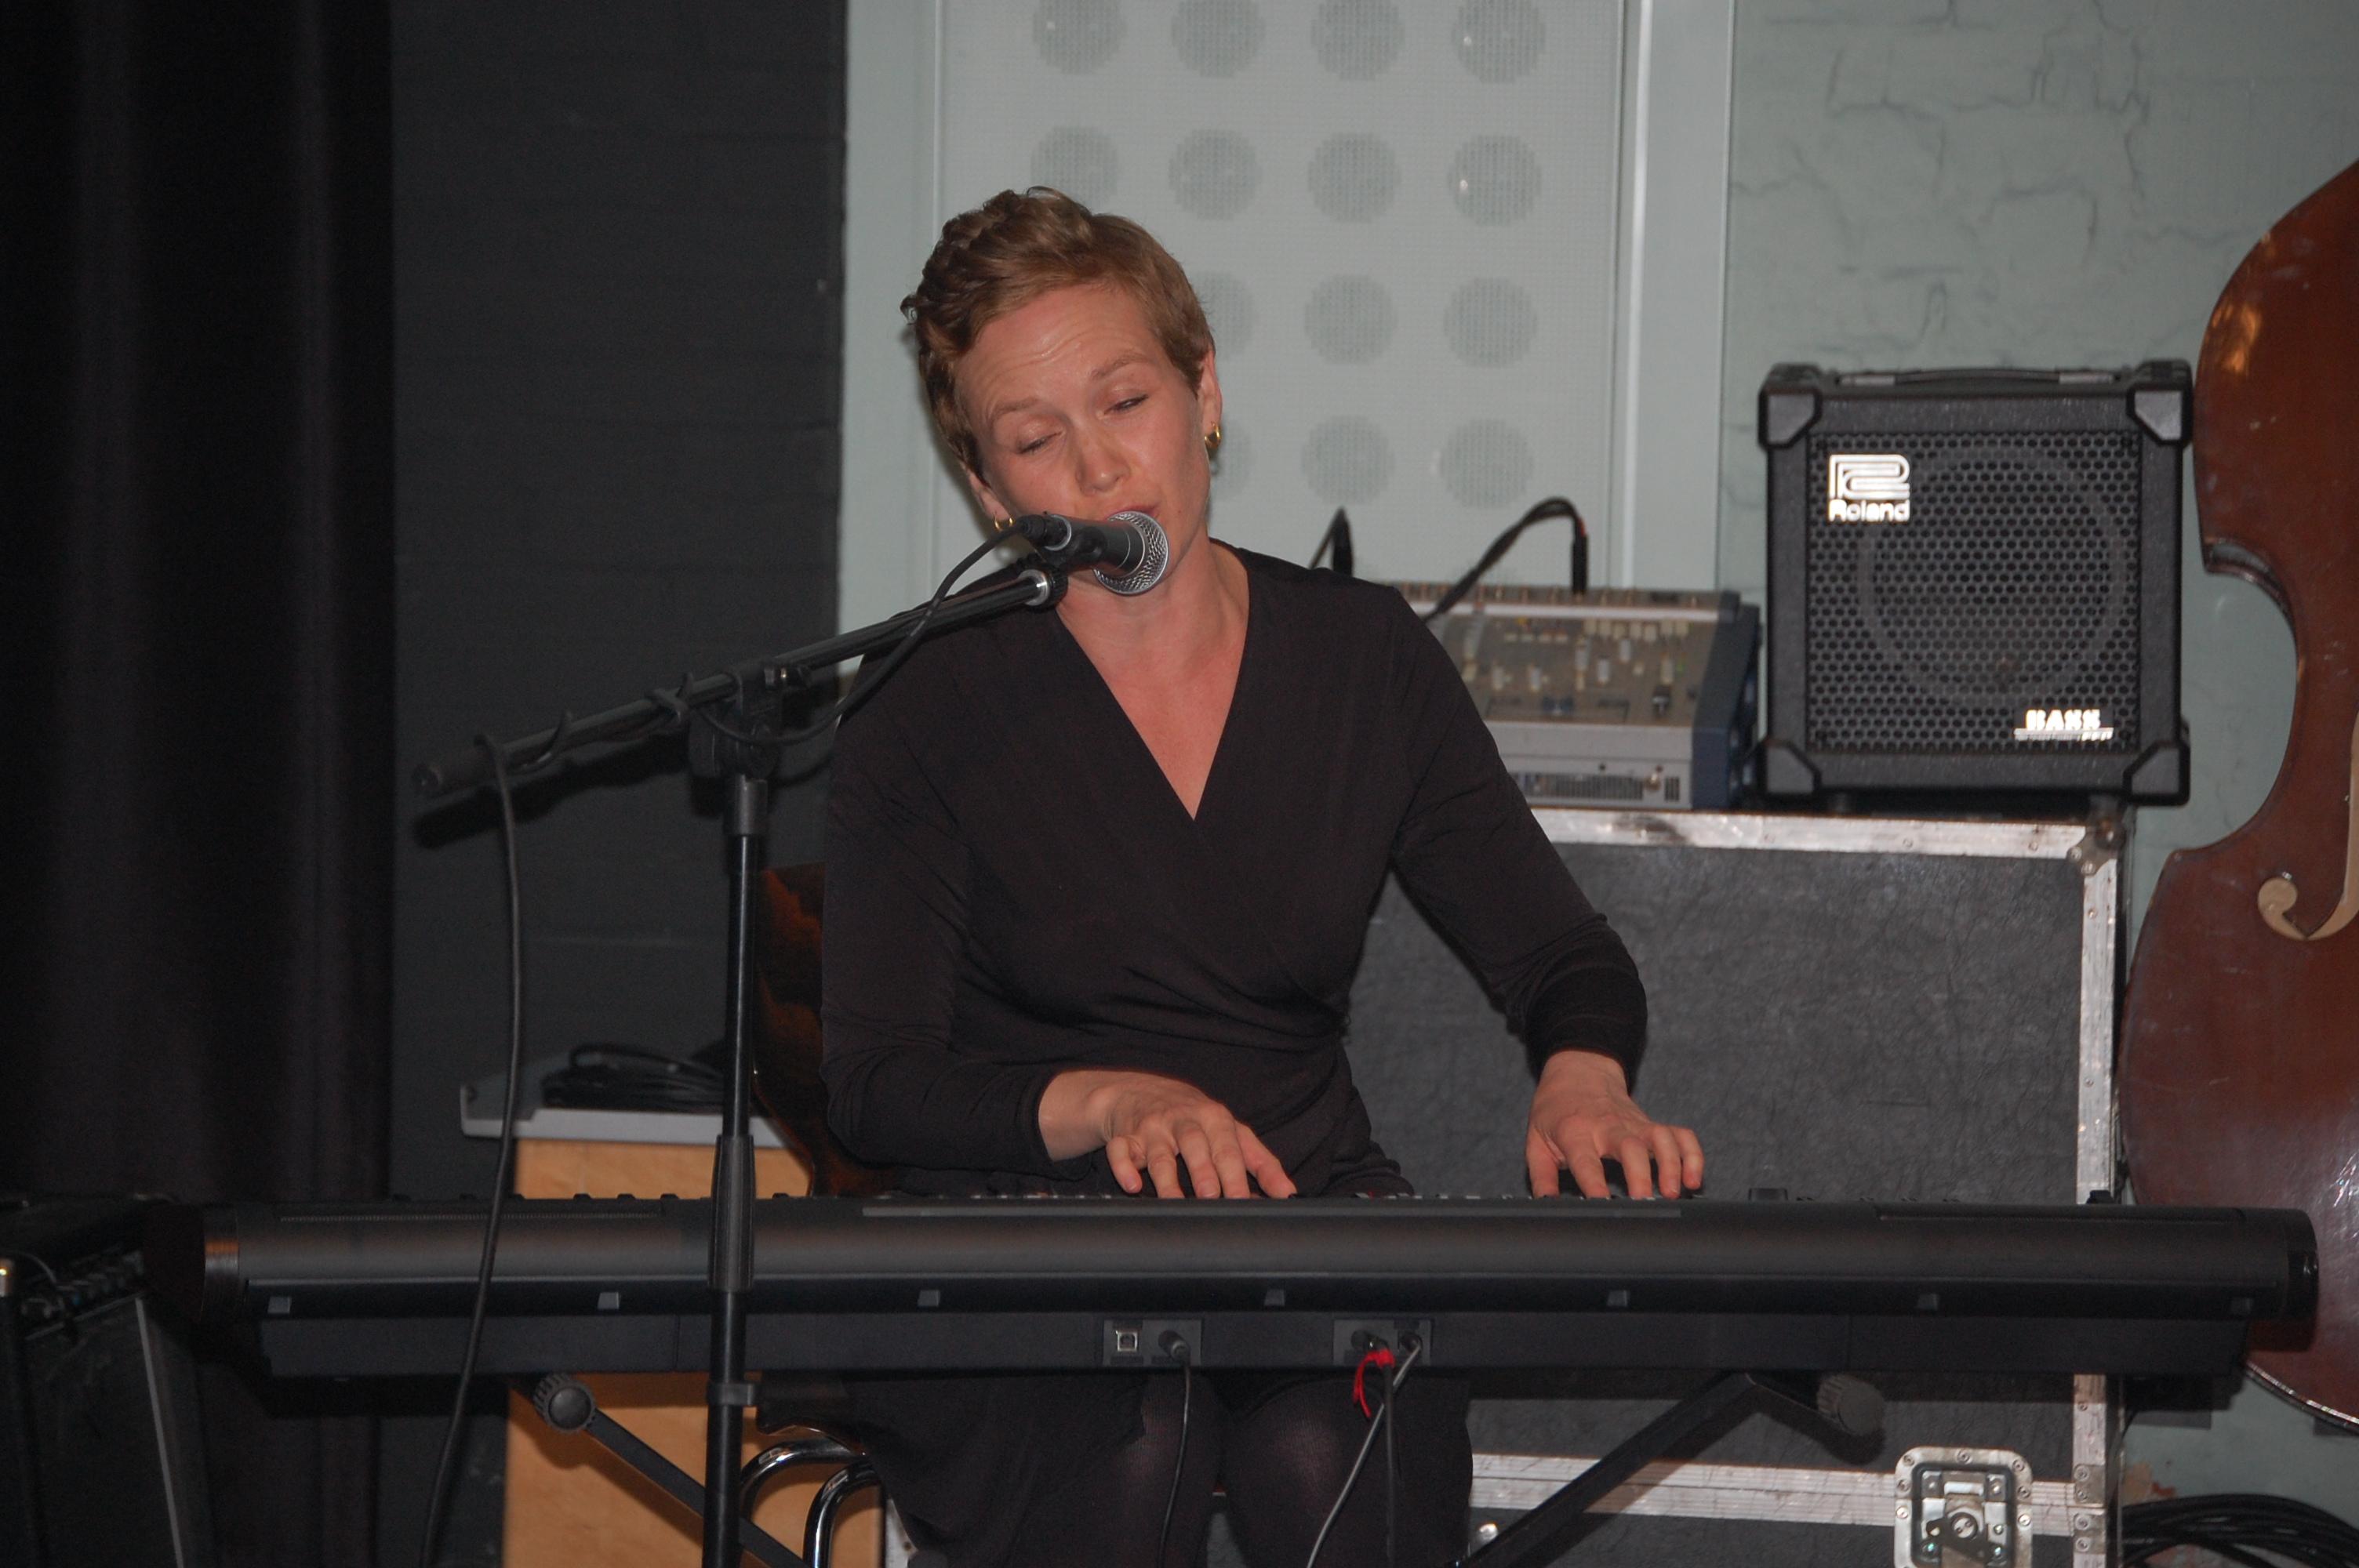 2019-09-21 Konzert Amalia Chikh mosaique LG (5)